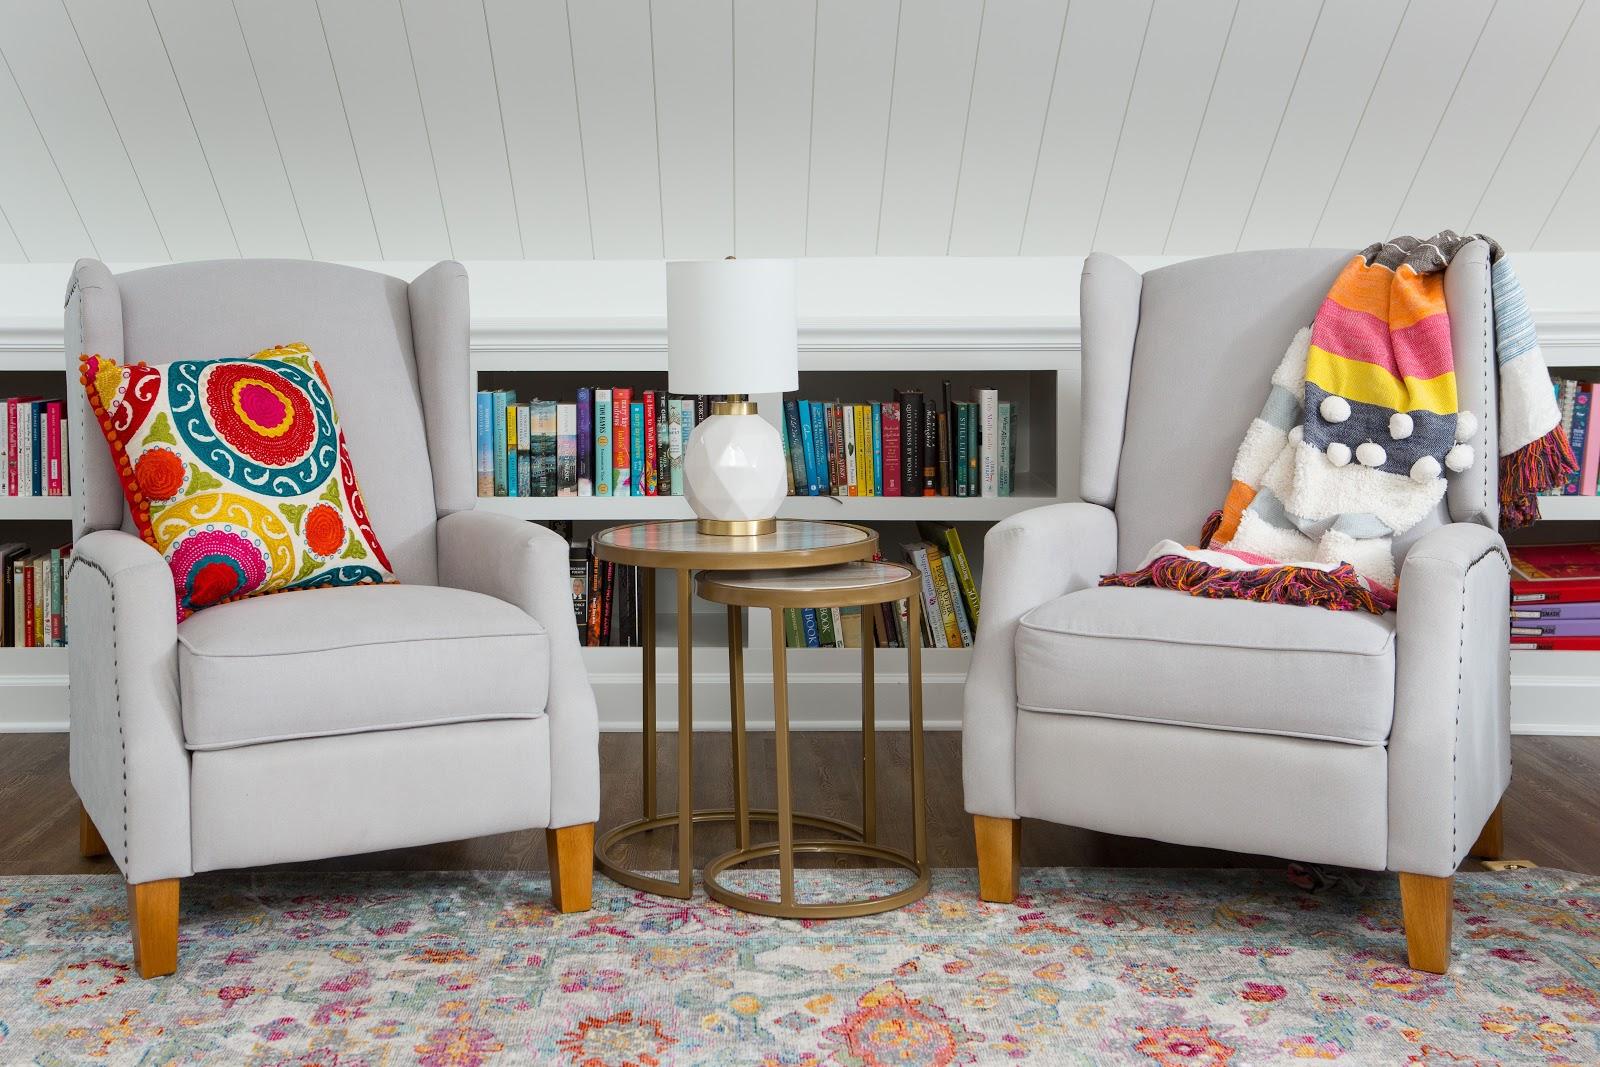 bonus room builtin bookshelf reading nook color classic traditional style interior design lebanon tn